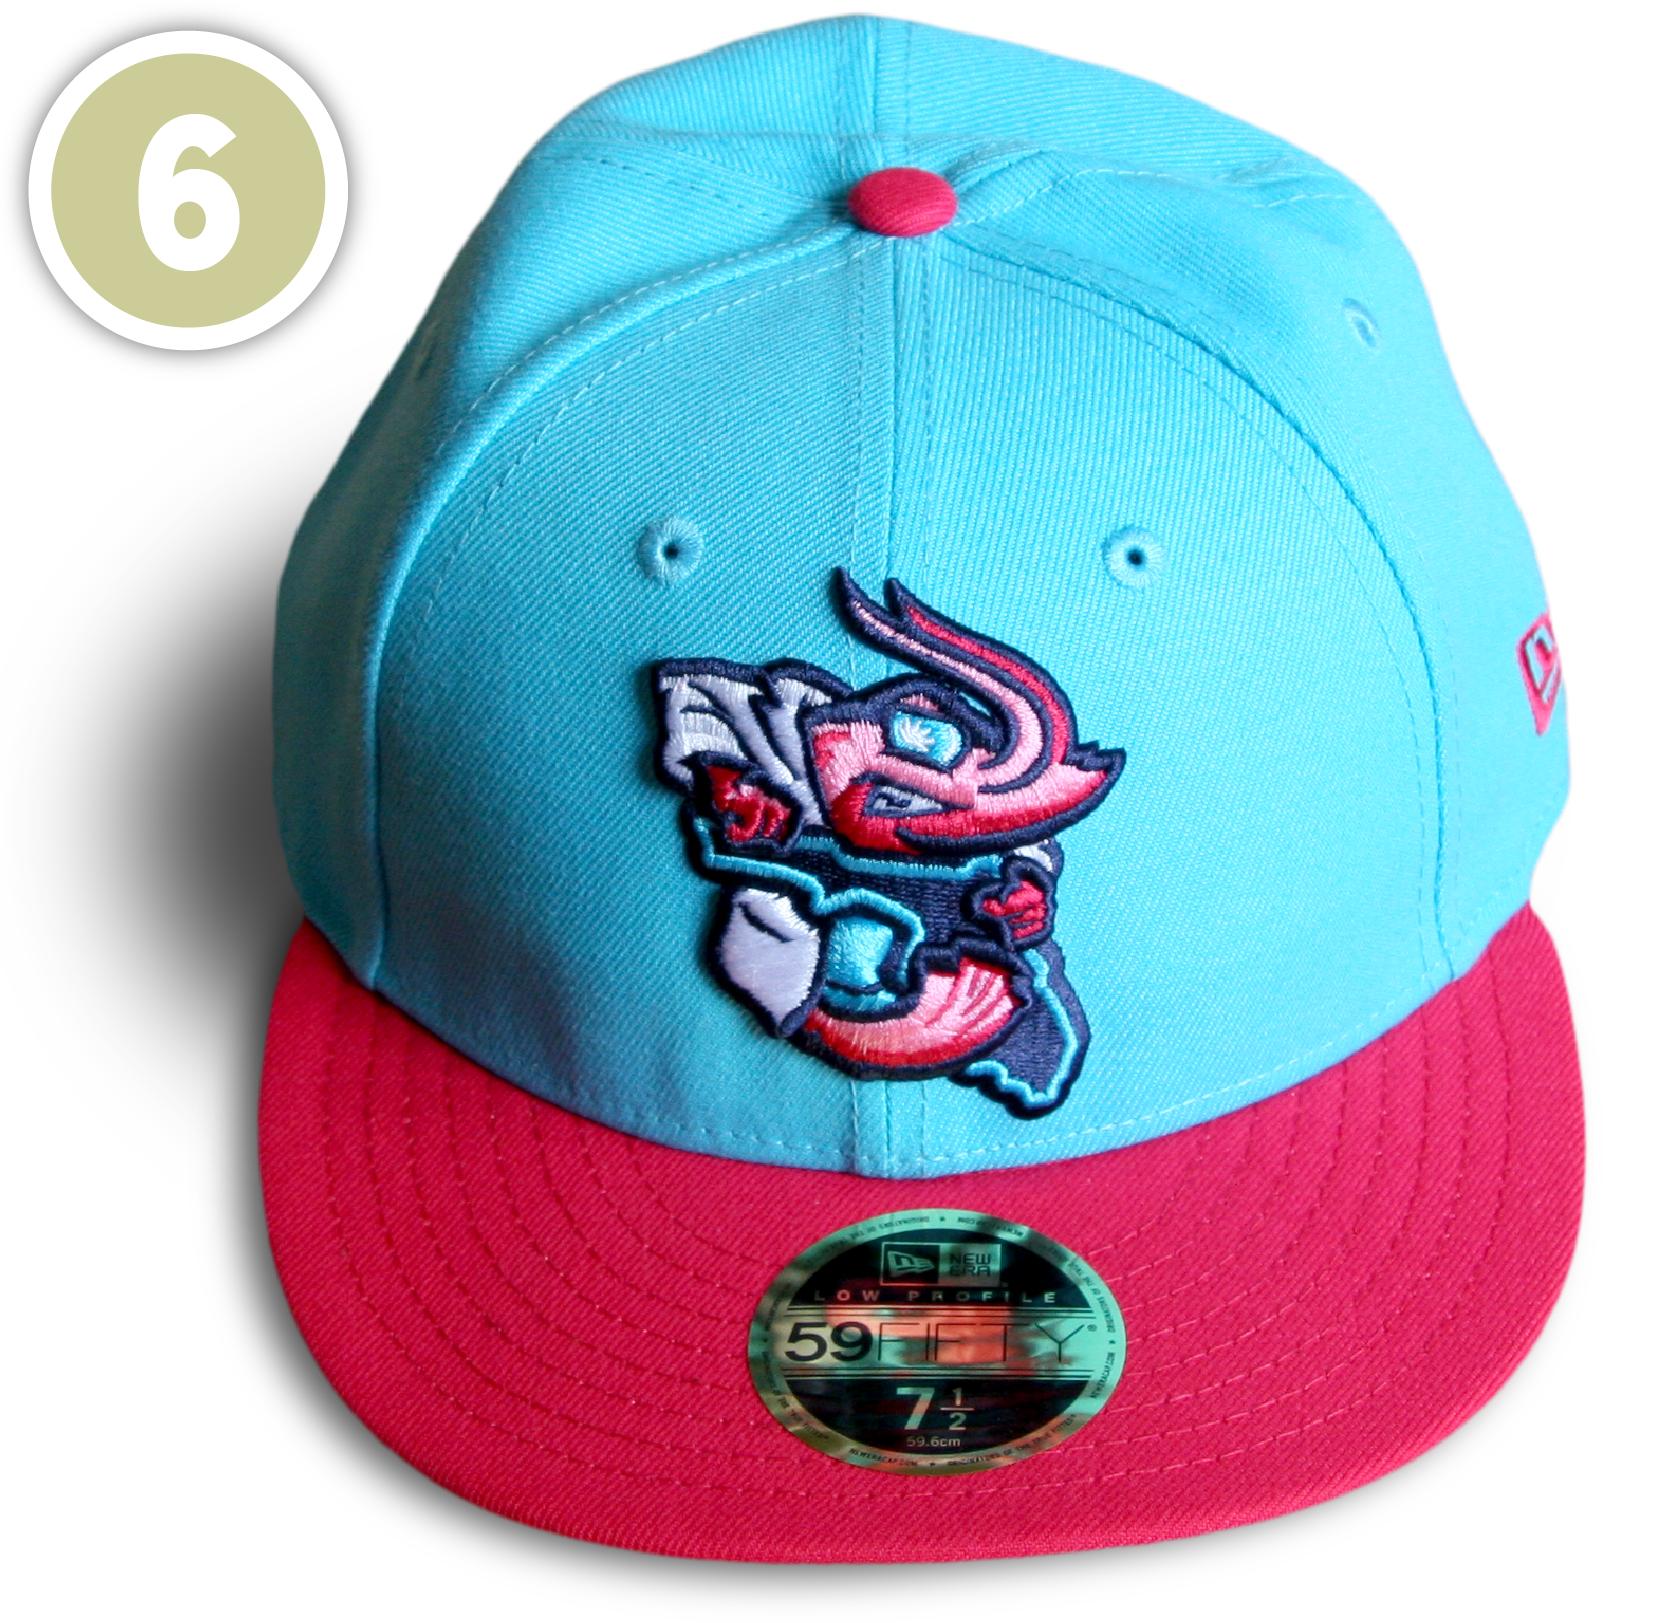 Jacksonville-3-BallparkMagic_Idea-6.png